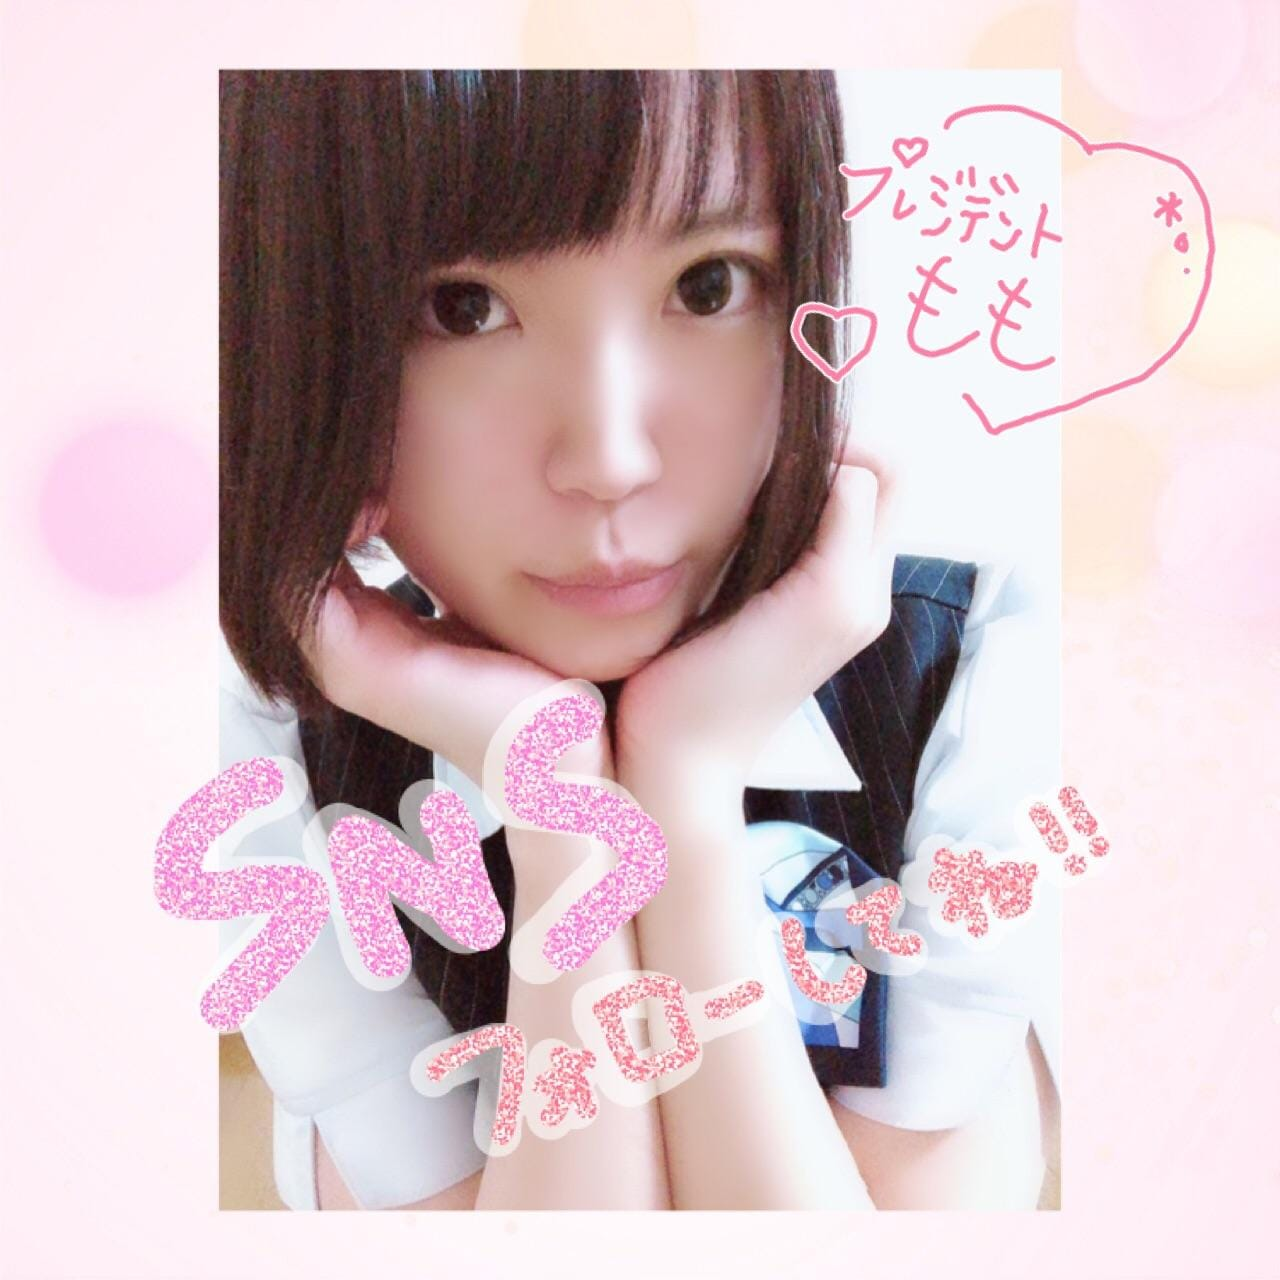 「SNSもcheckしてね【定期】」08/04(土) 13:59 | ももの写メ・風俗動画